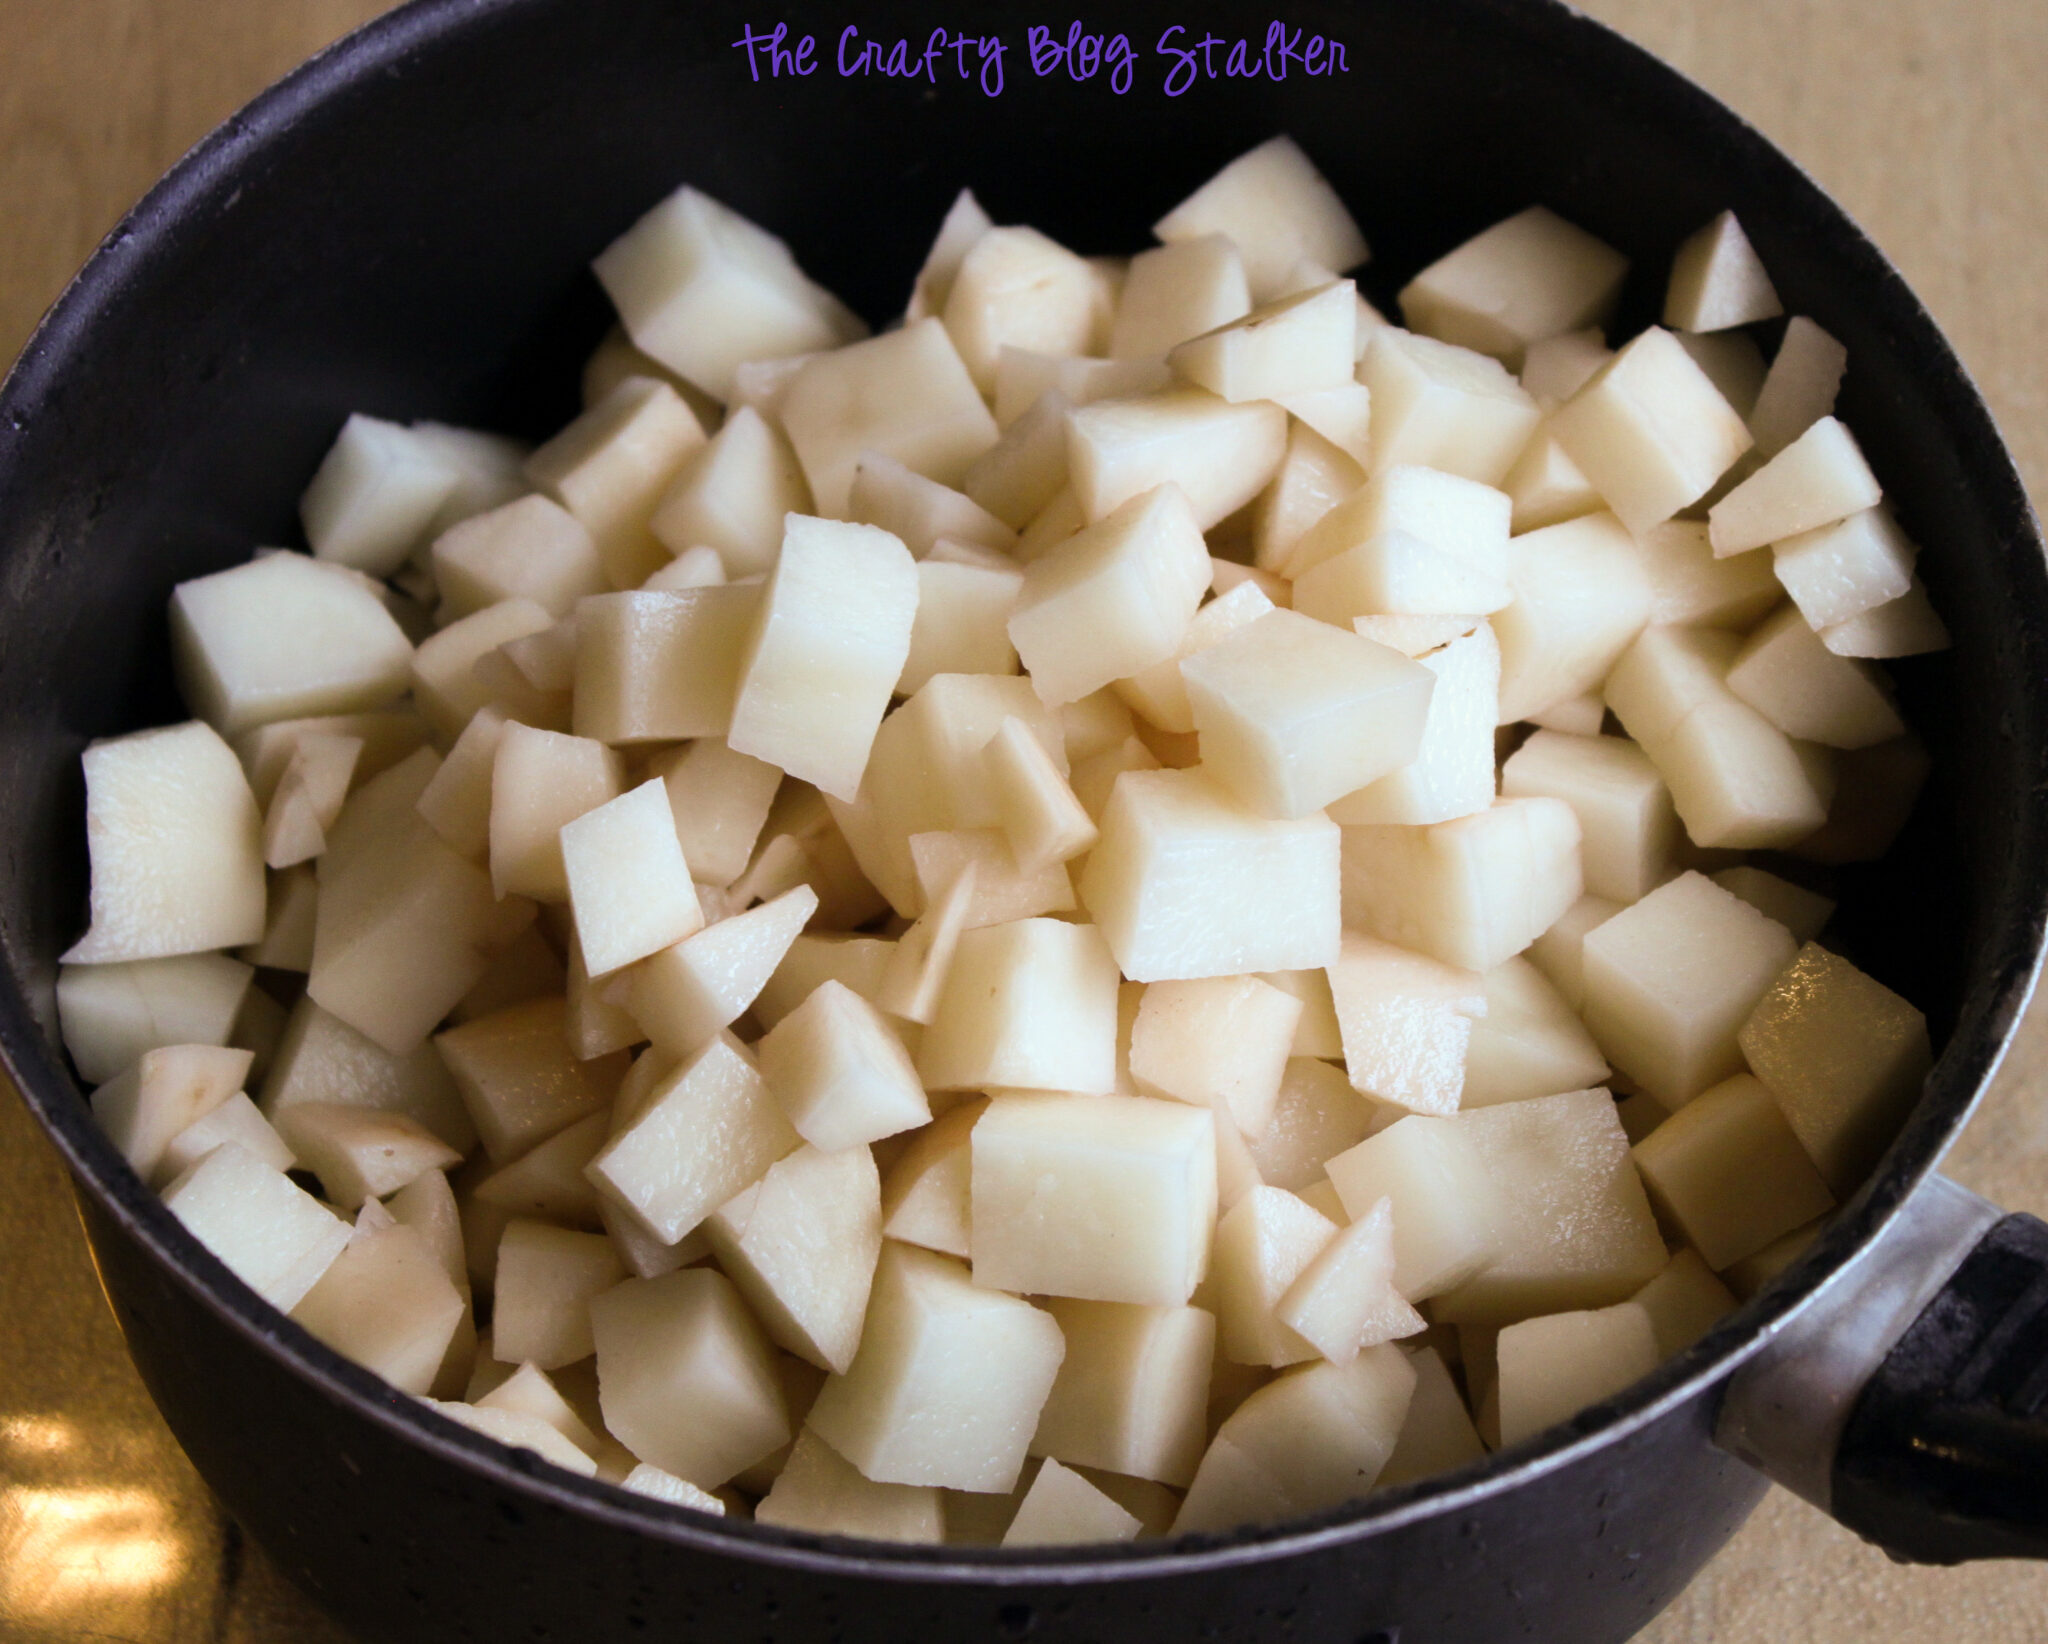 image of diced potatoes in a saucepan